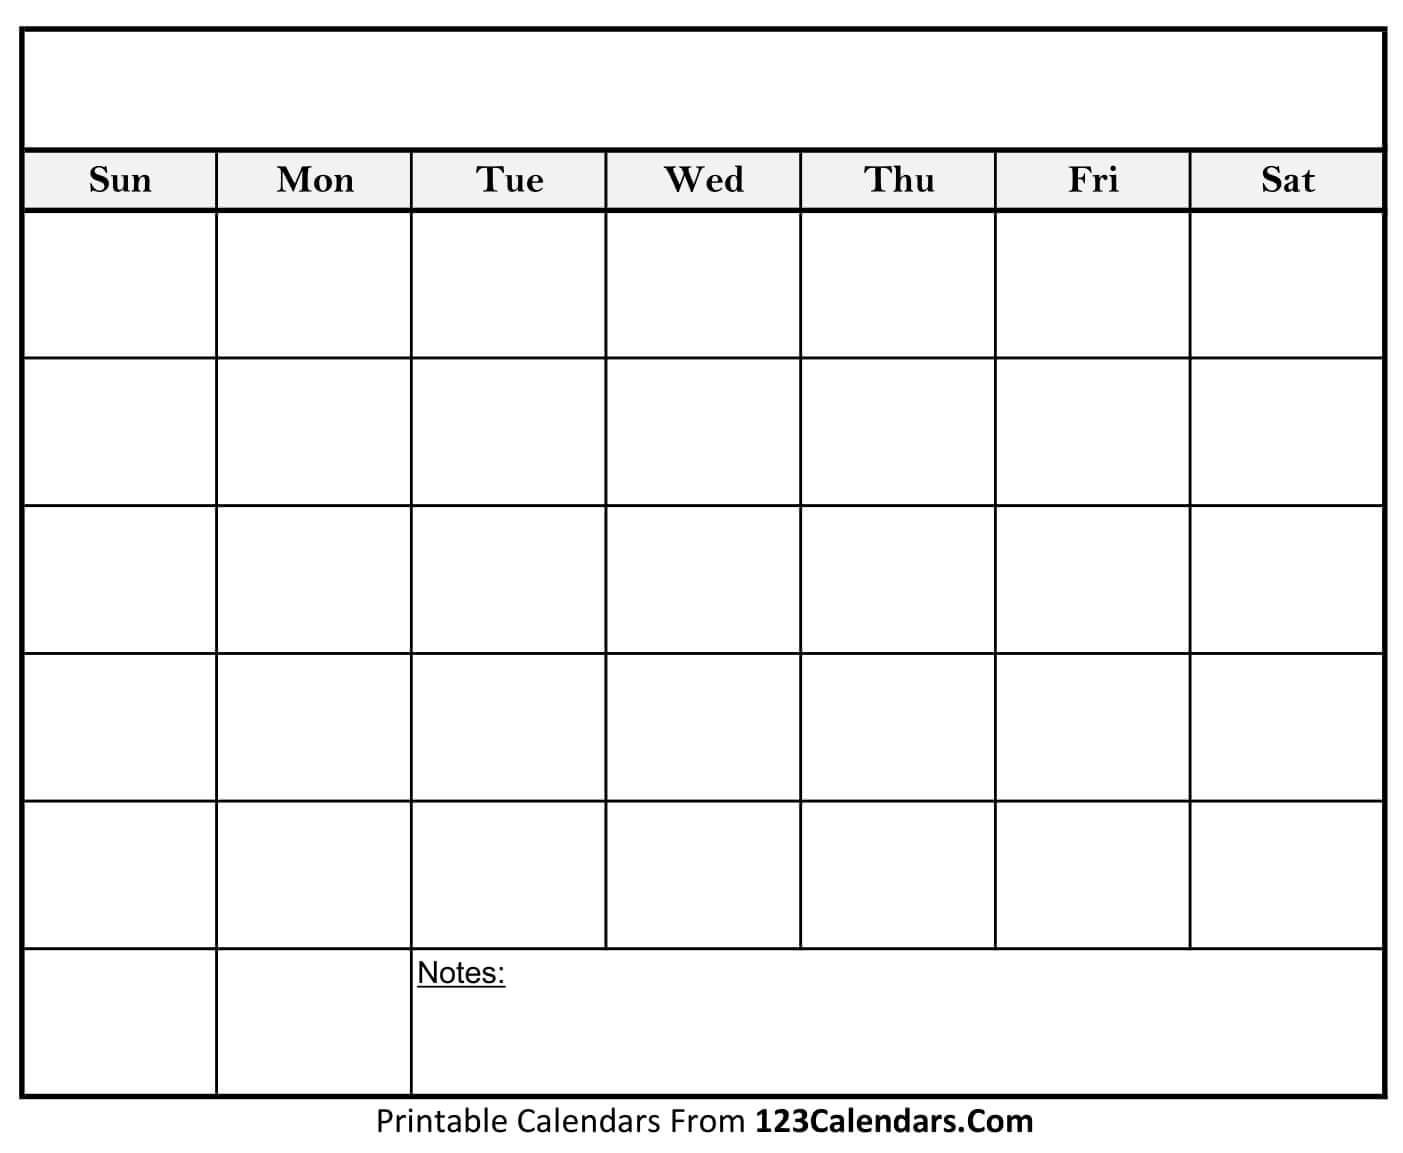 Free Printable Blank Calendar | 123Calendars throughout Printable Blank Calendar Template